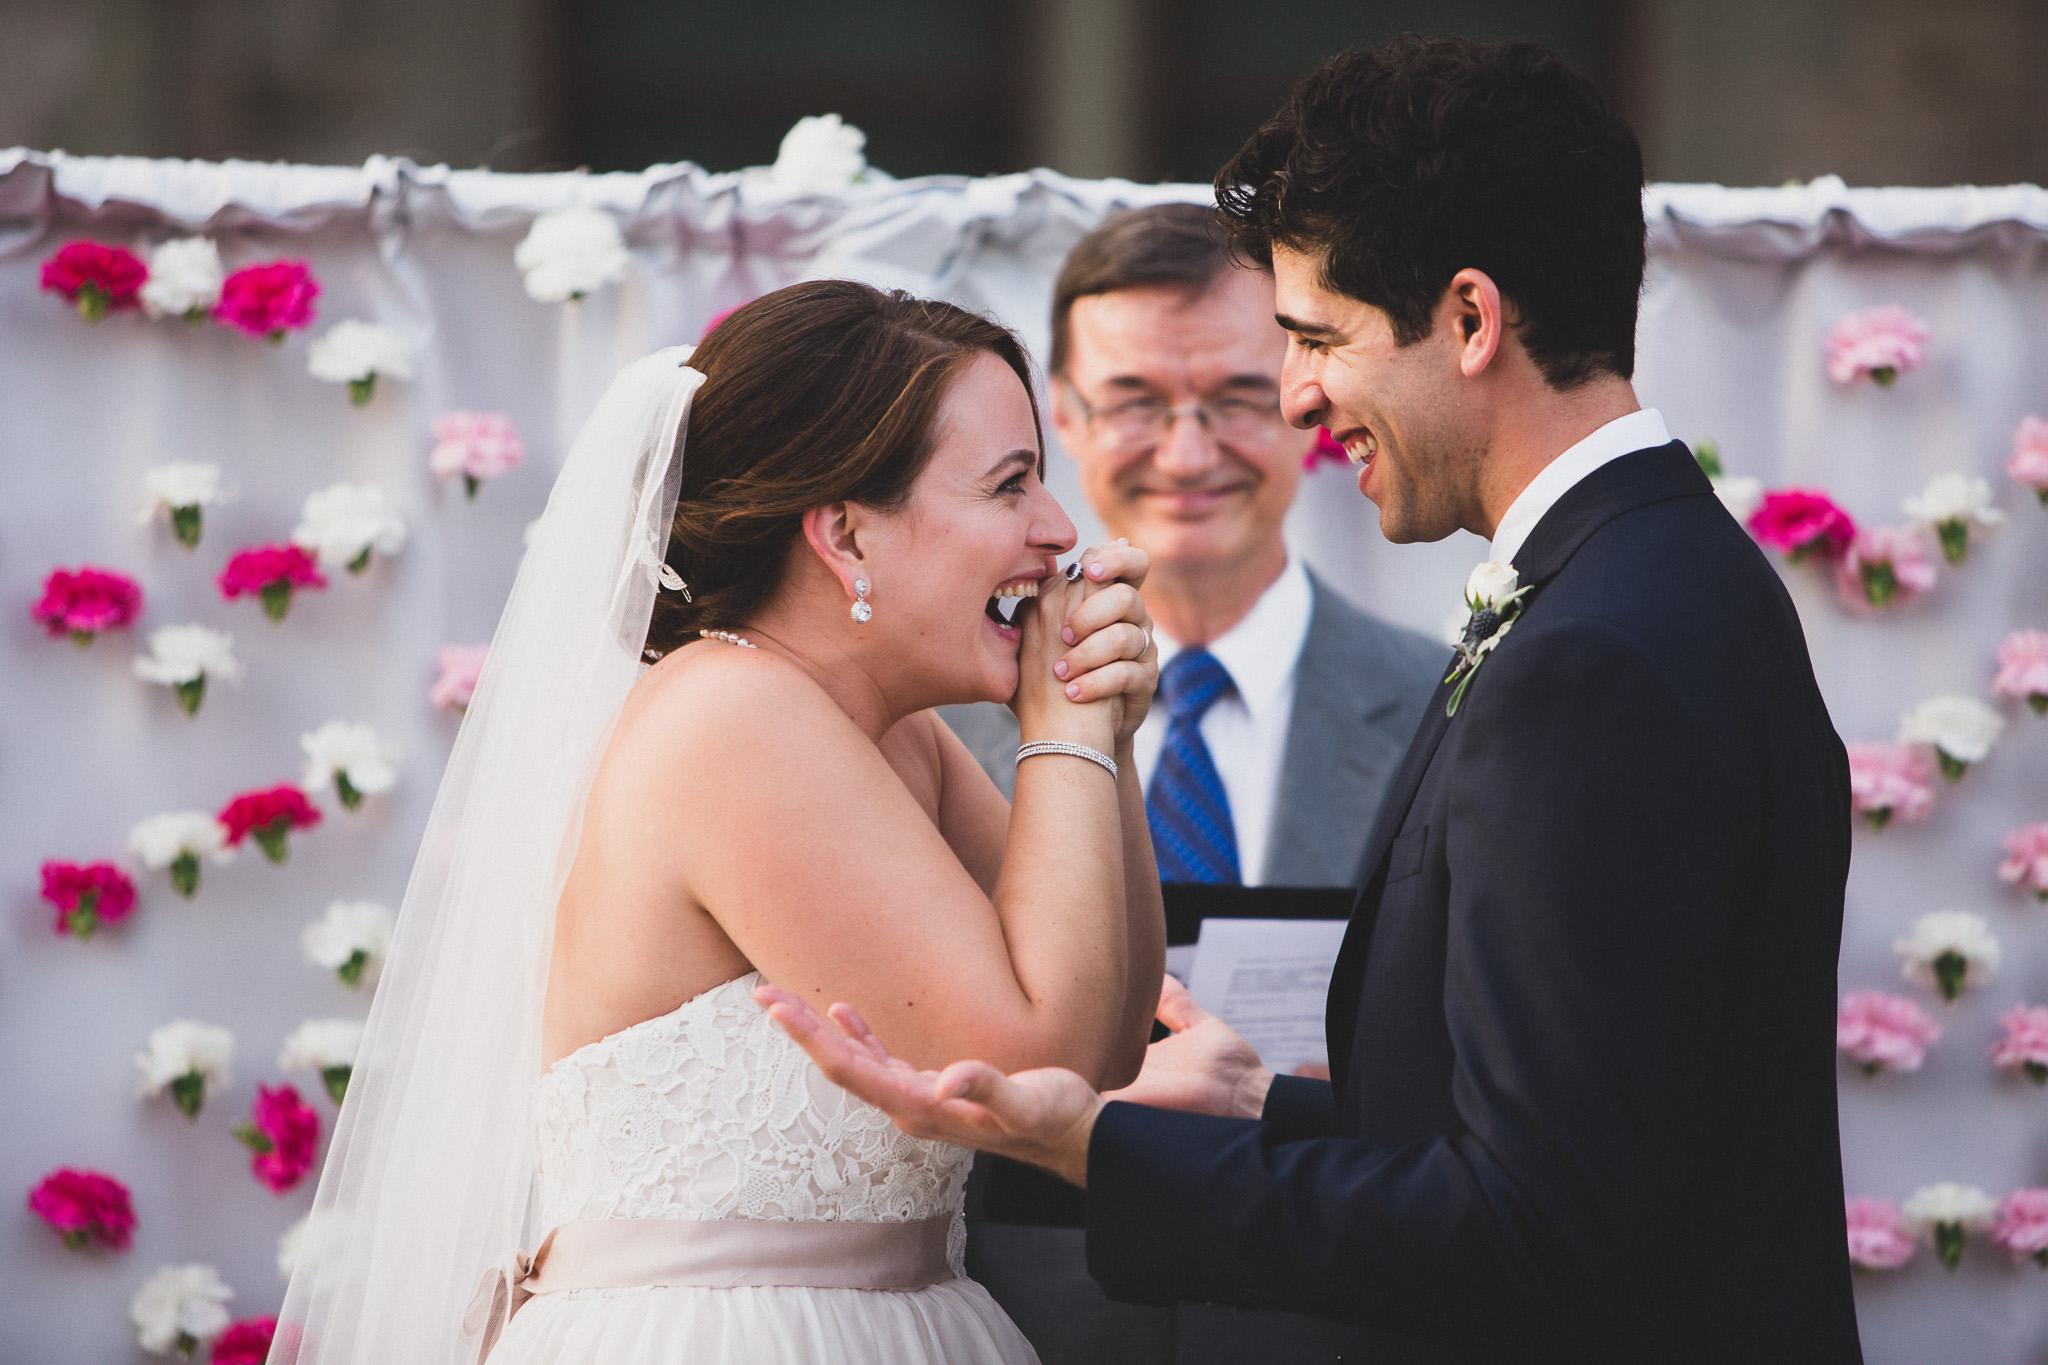 Capturing candid moments, wedding photos